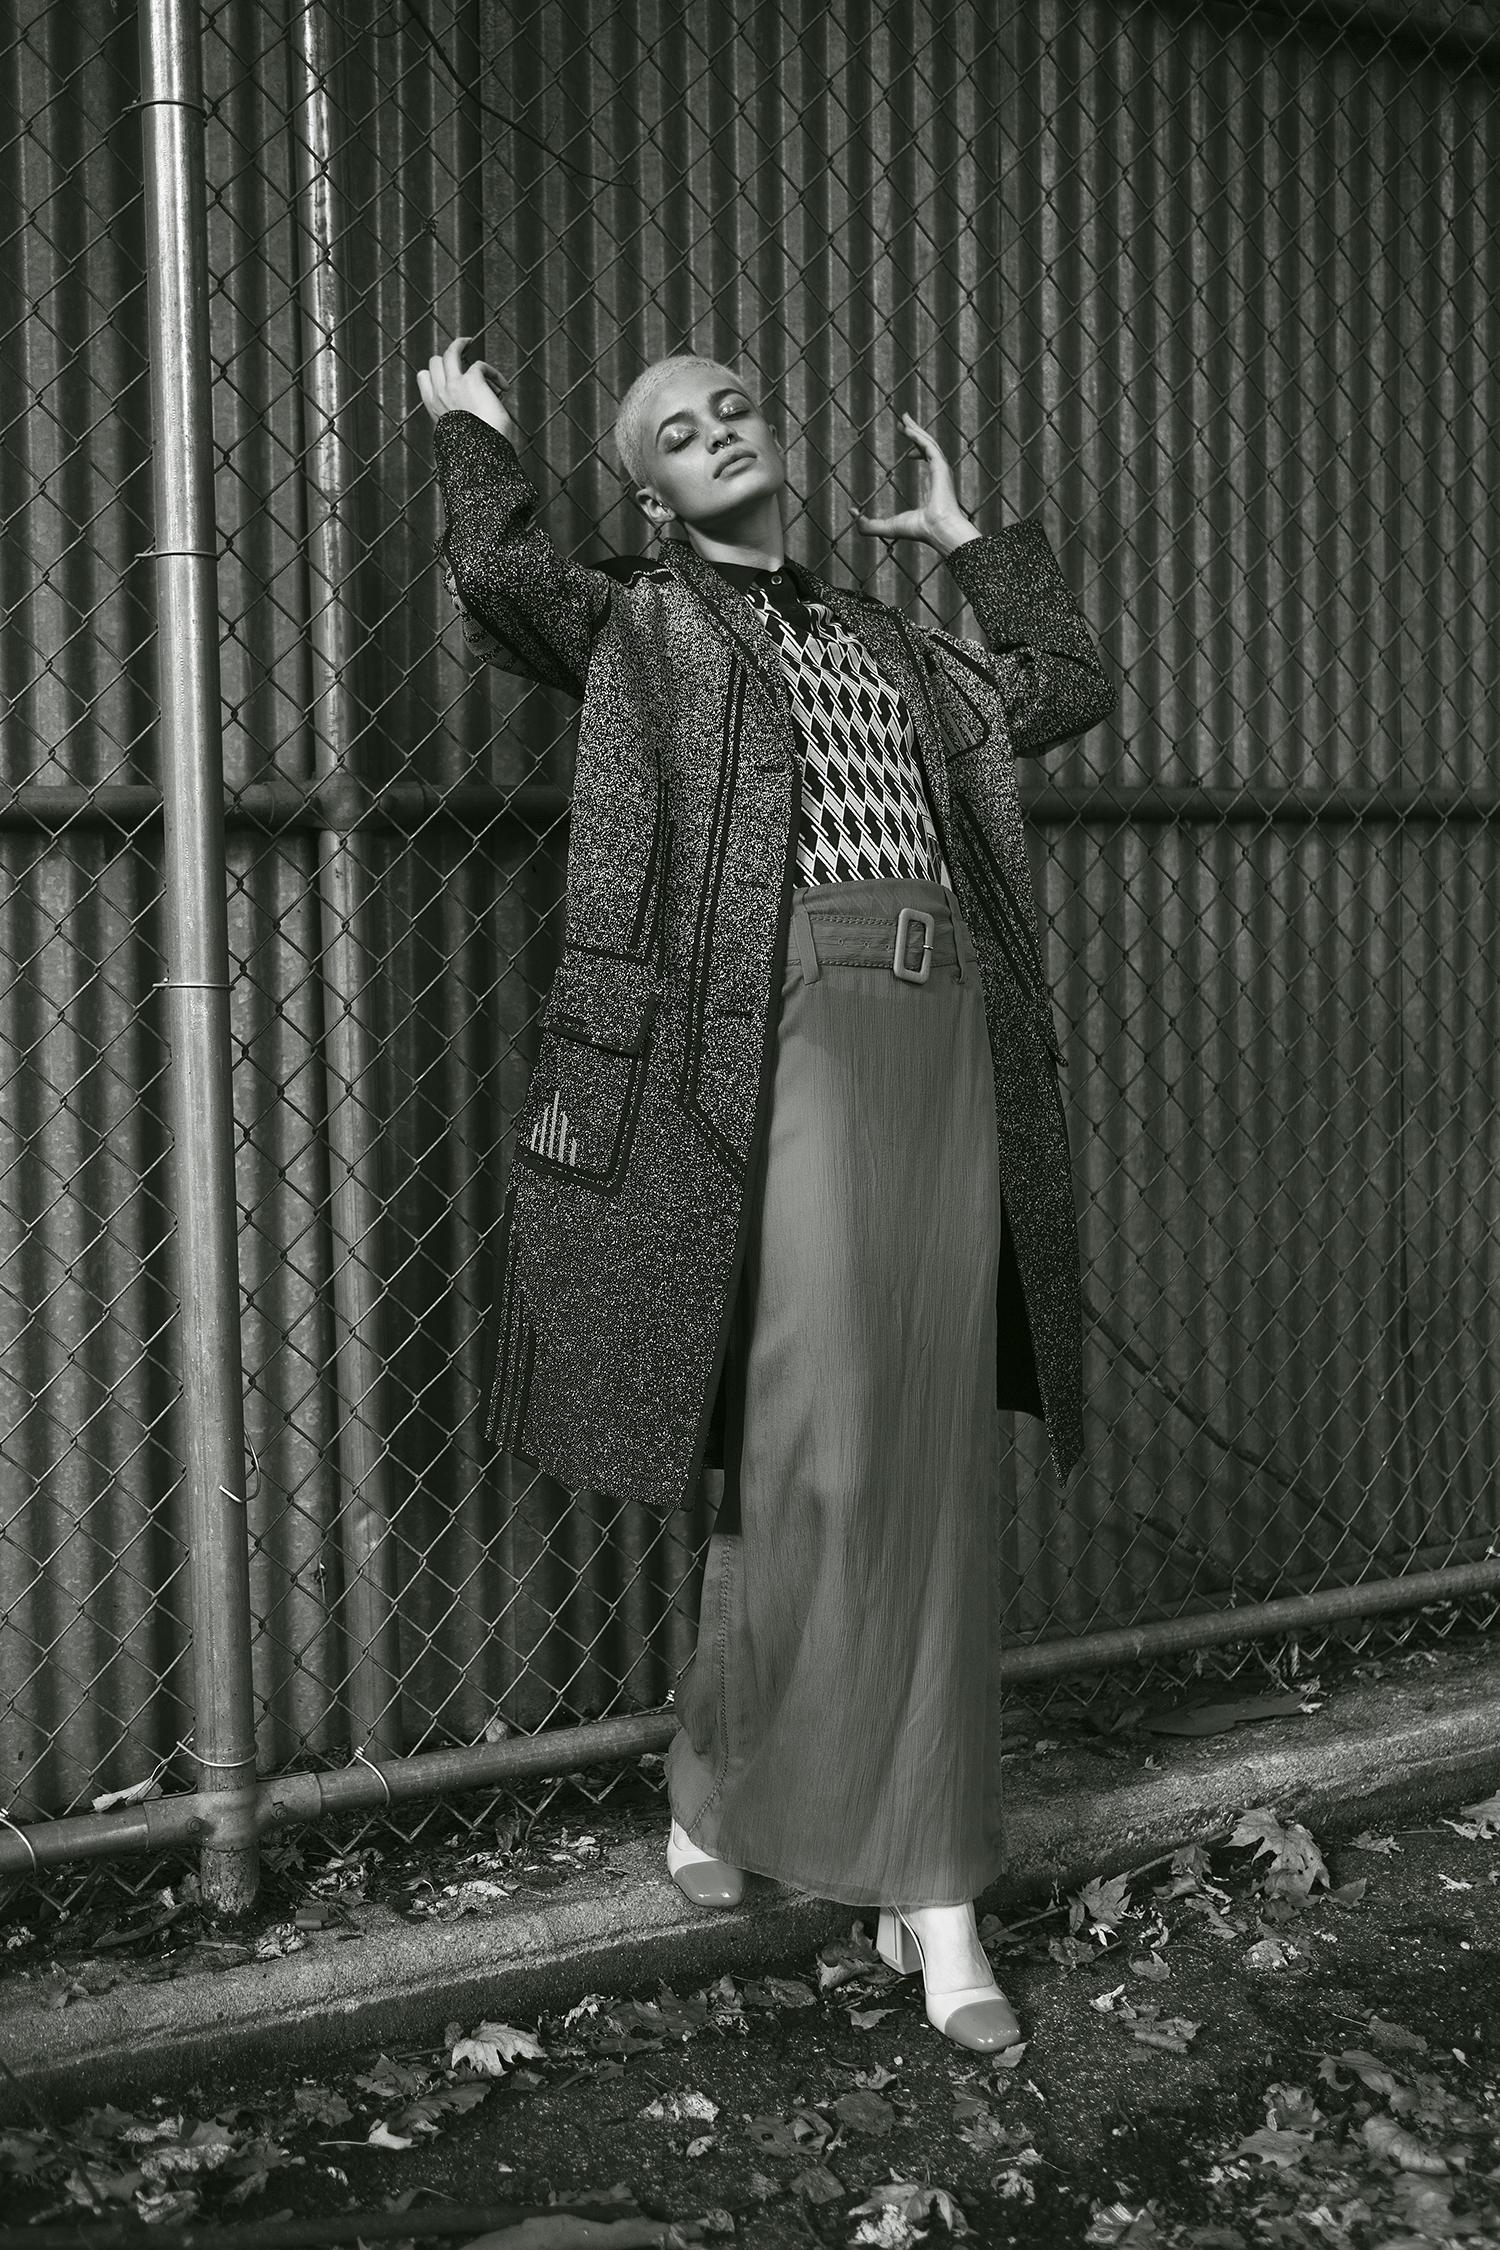 Abrigo Prada, falda chiffon, top tejido de lana y zapatos de Prada, Saks Fifth Avenue.